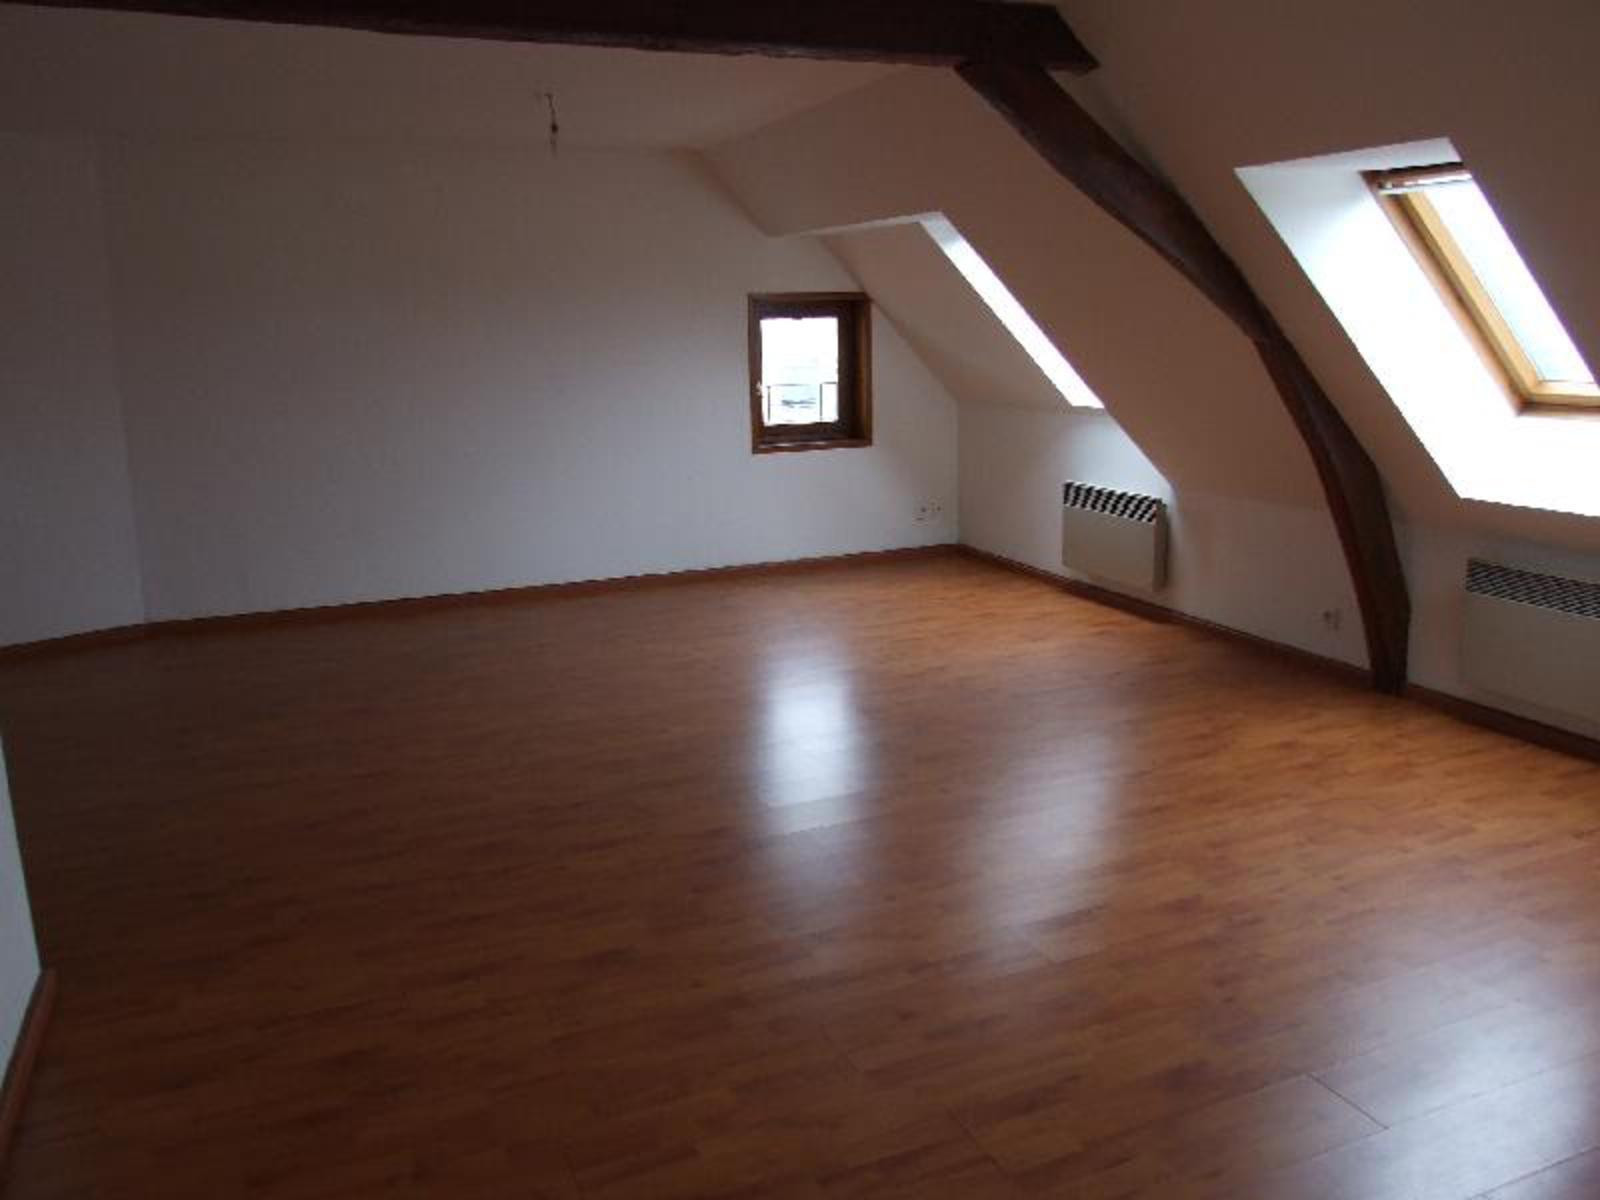 Salle De Bain St Omer ~ beau t3 saint omer immobili re de france